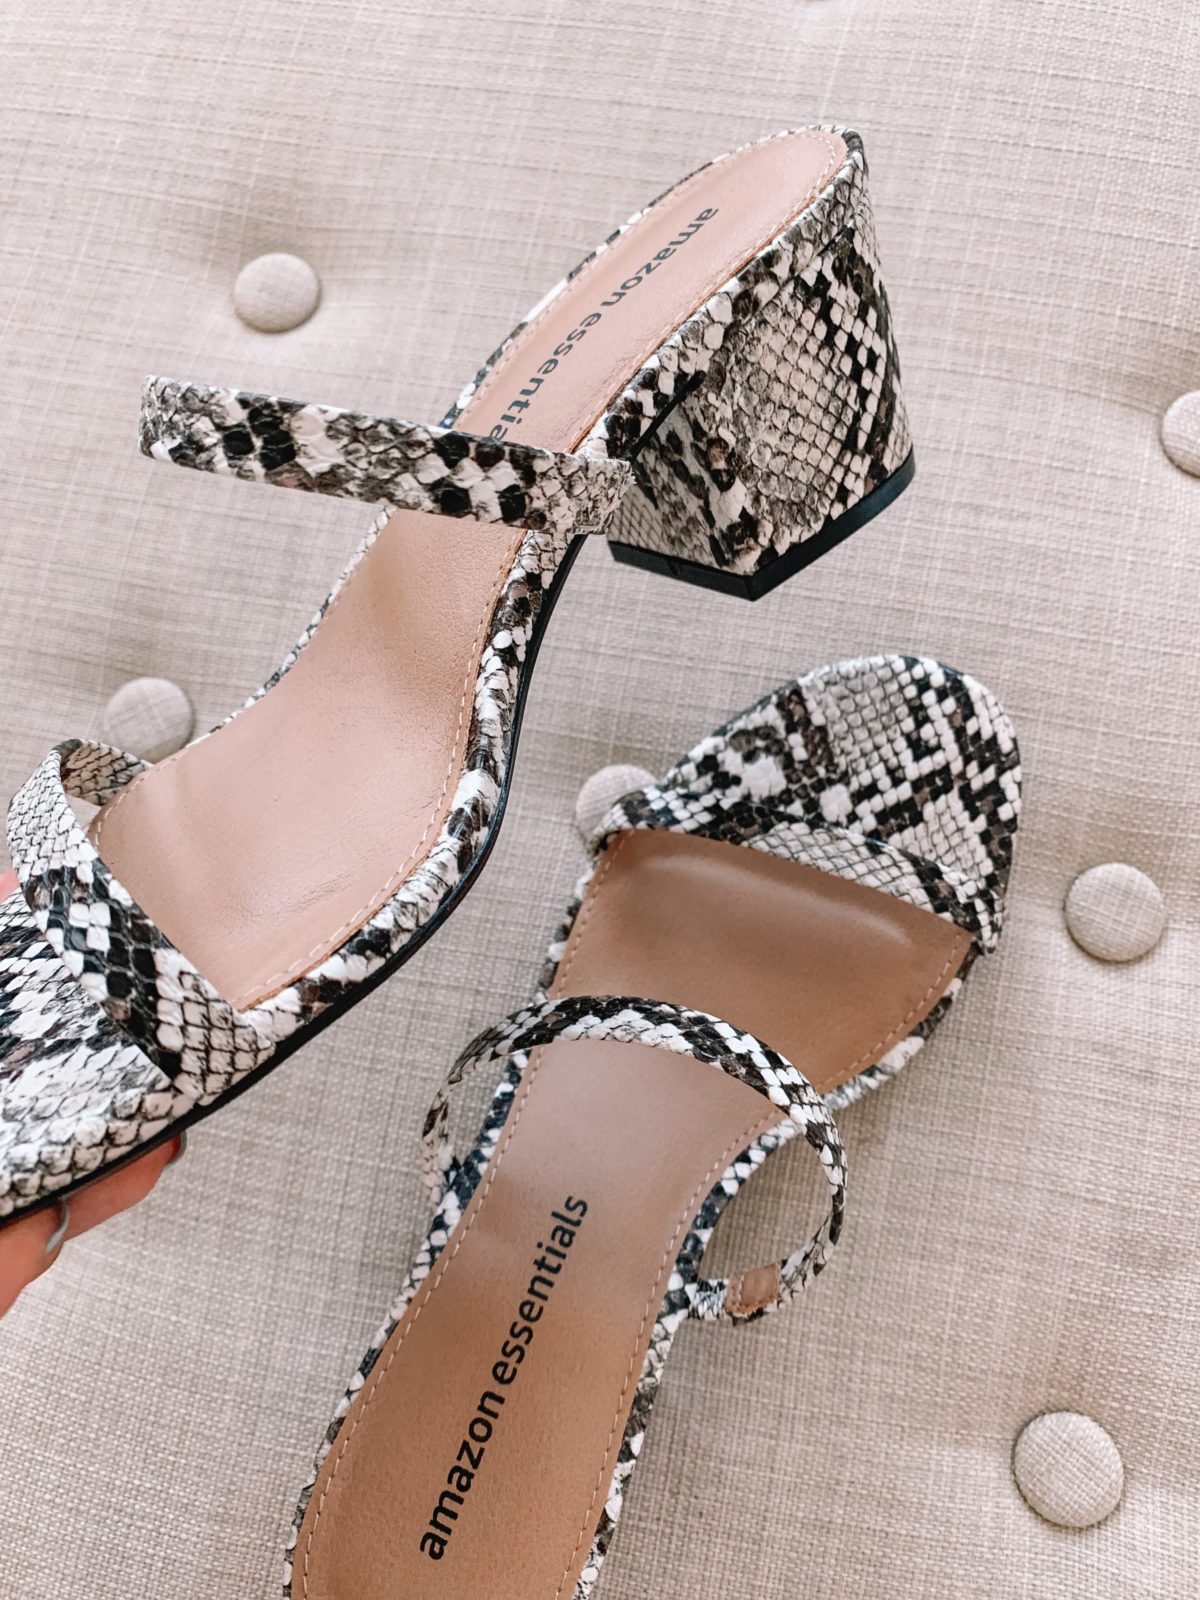 Amazon Fashion Faves, Snakeskin Sandals